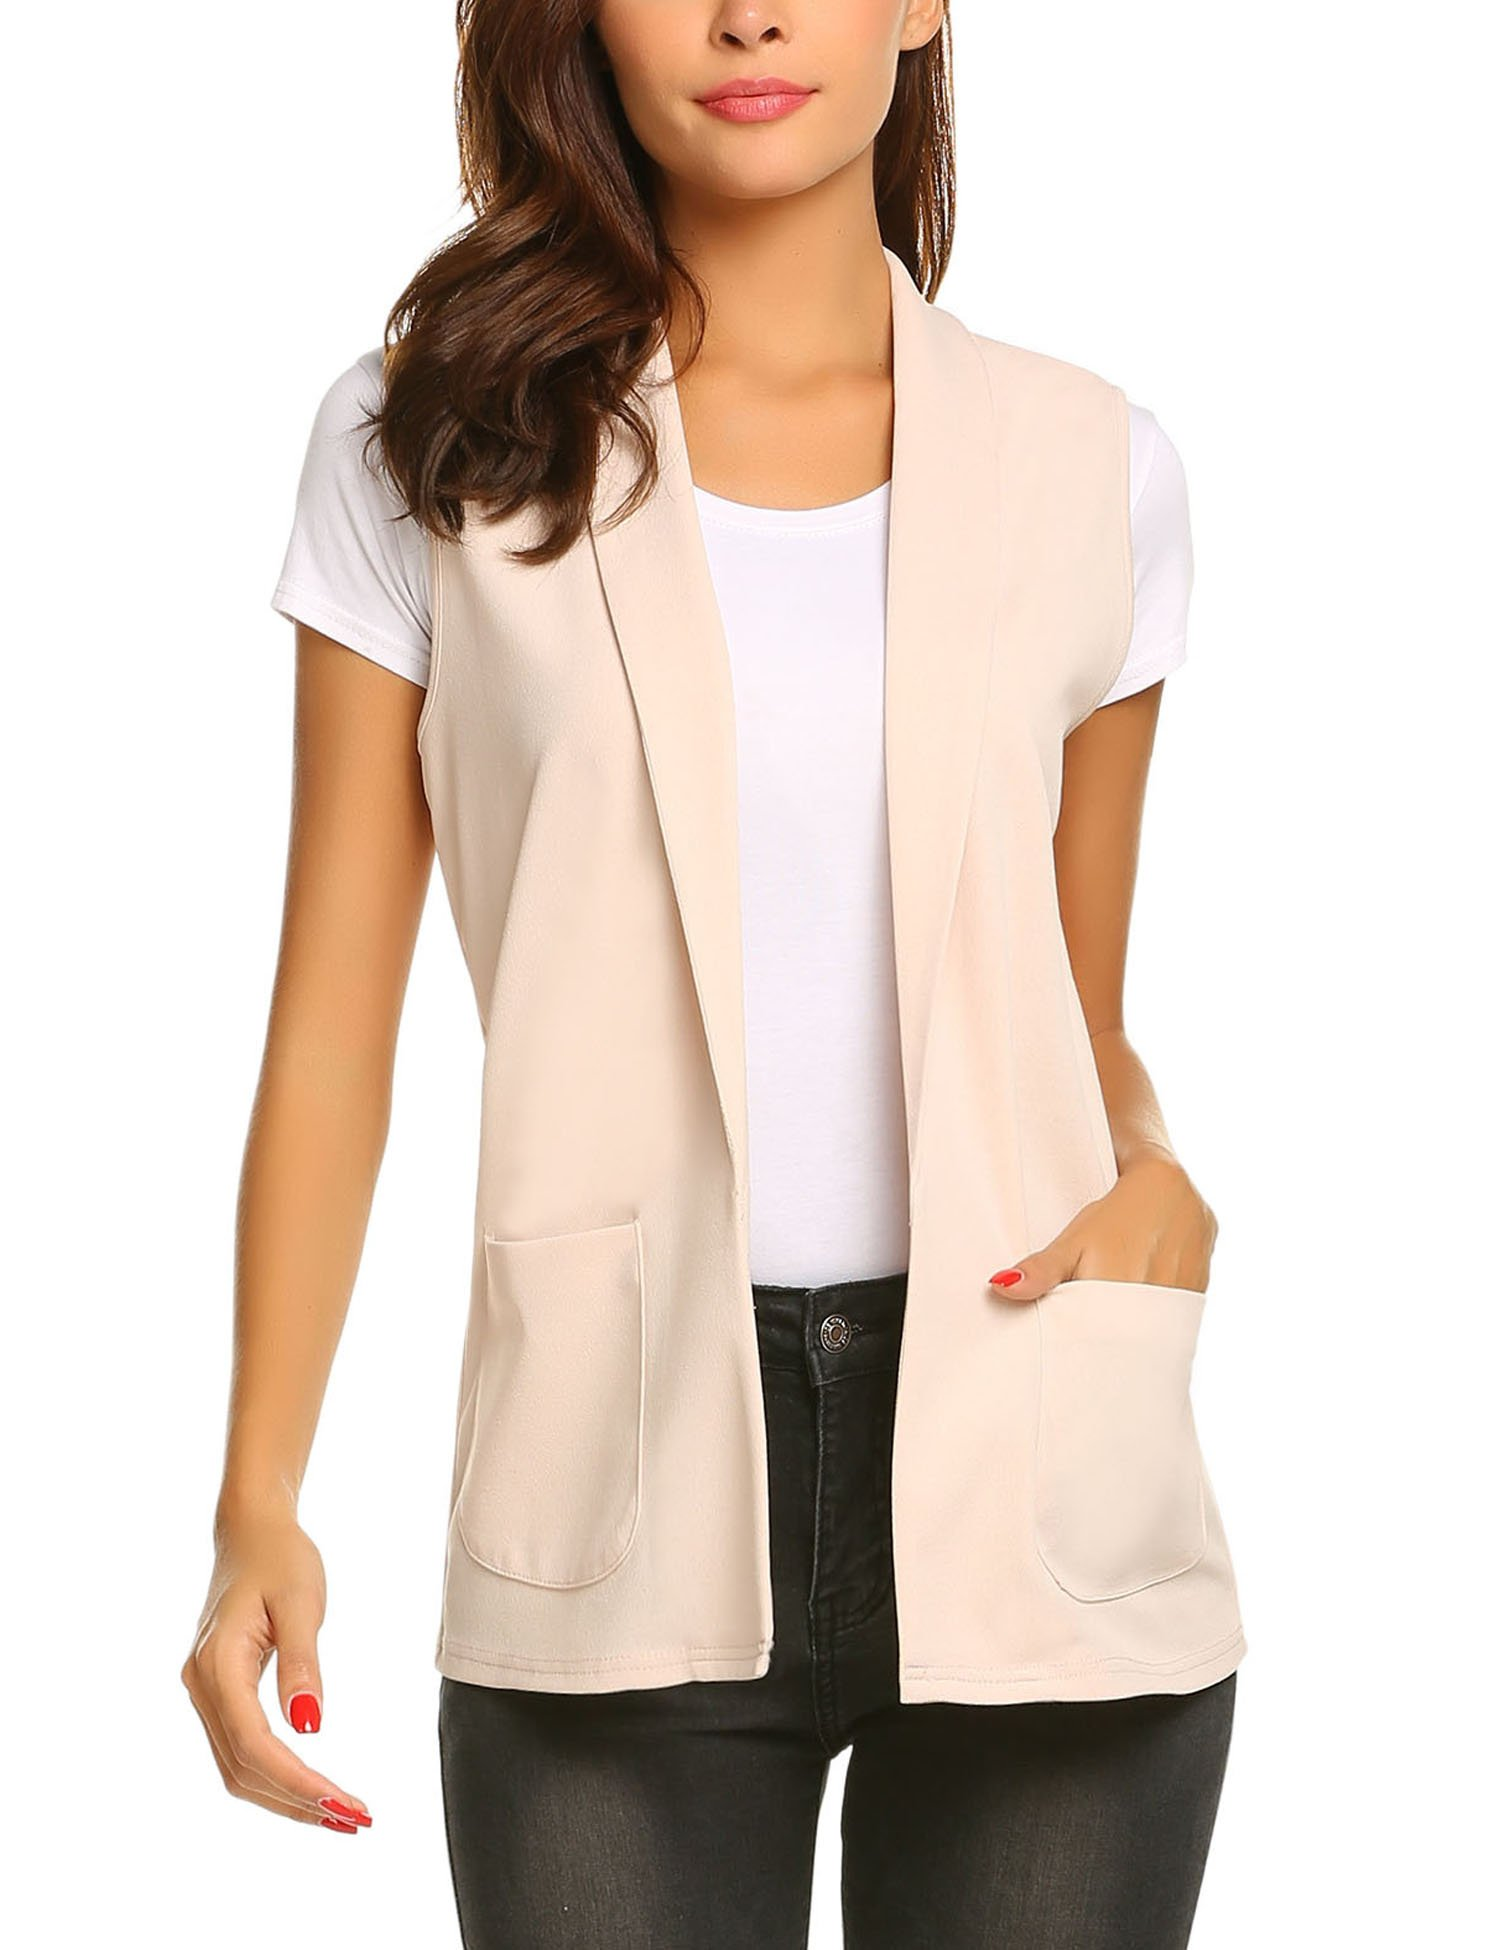 Dealwell Women Sleeveless Shawl Draped Blazer Open Front Pocket Cardigan Vest Top (Light Pink, Small)